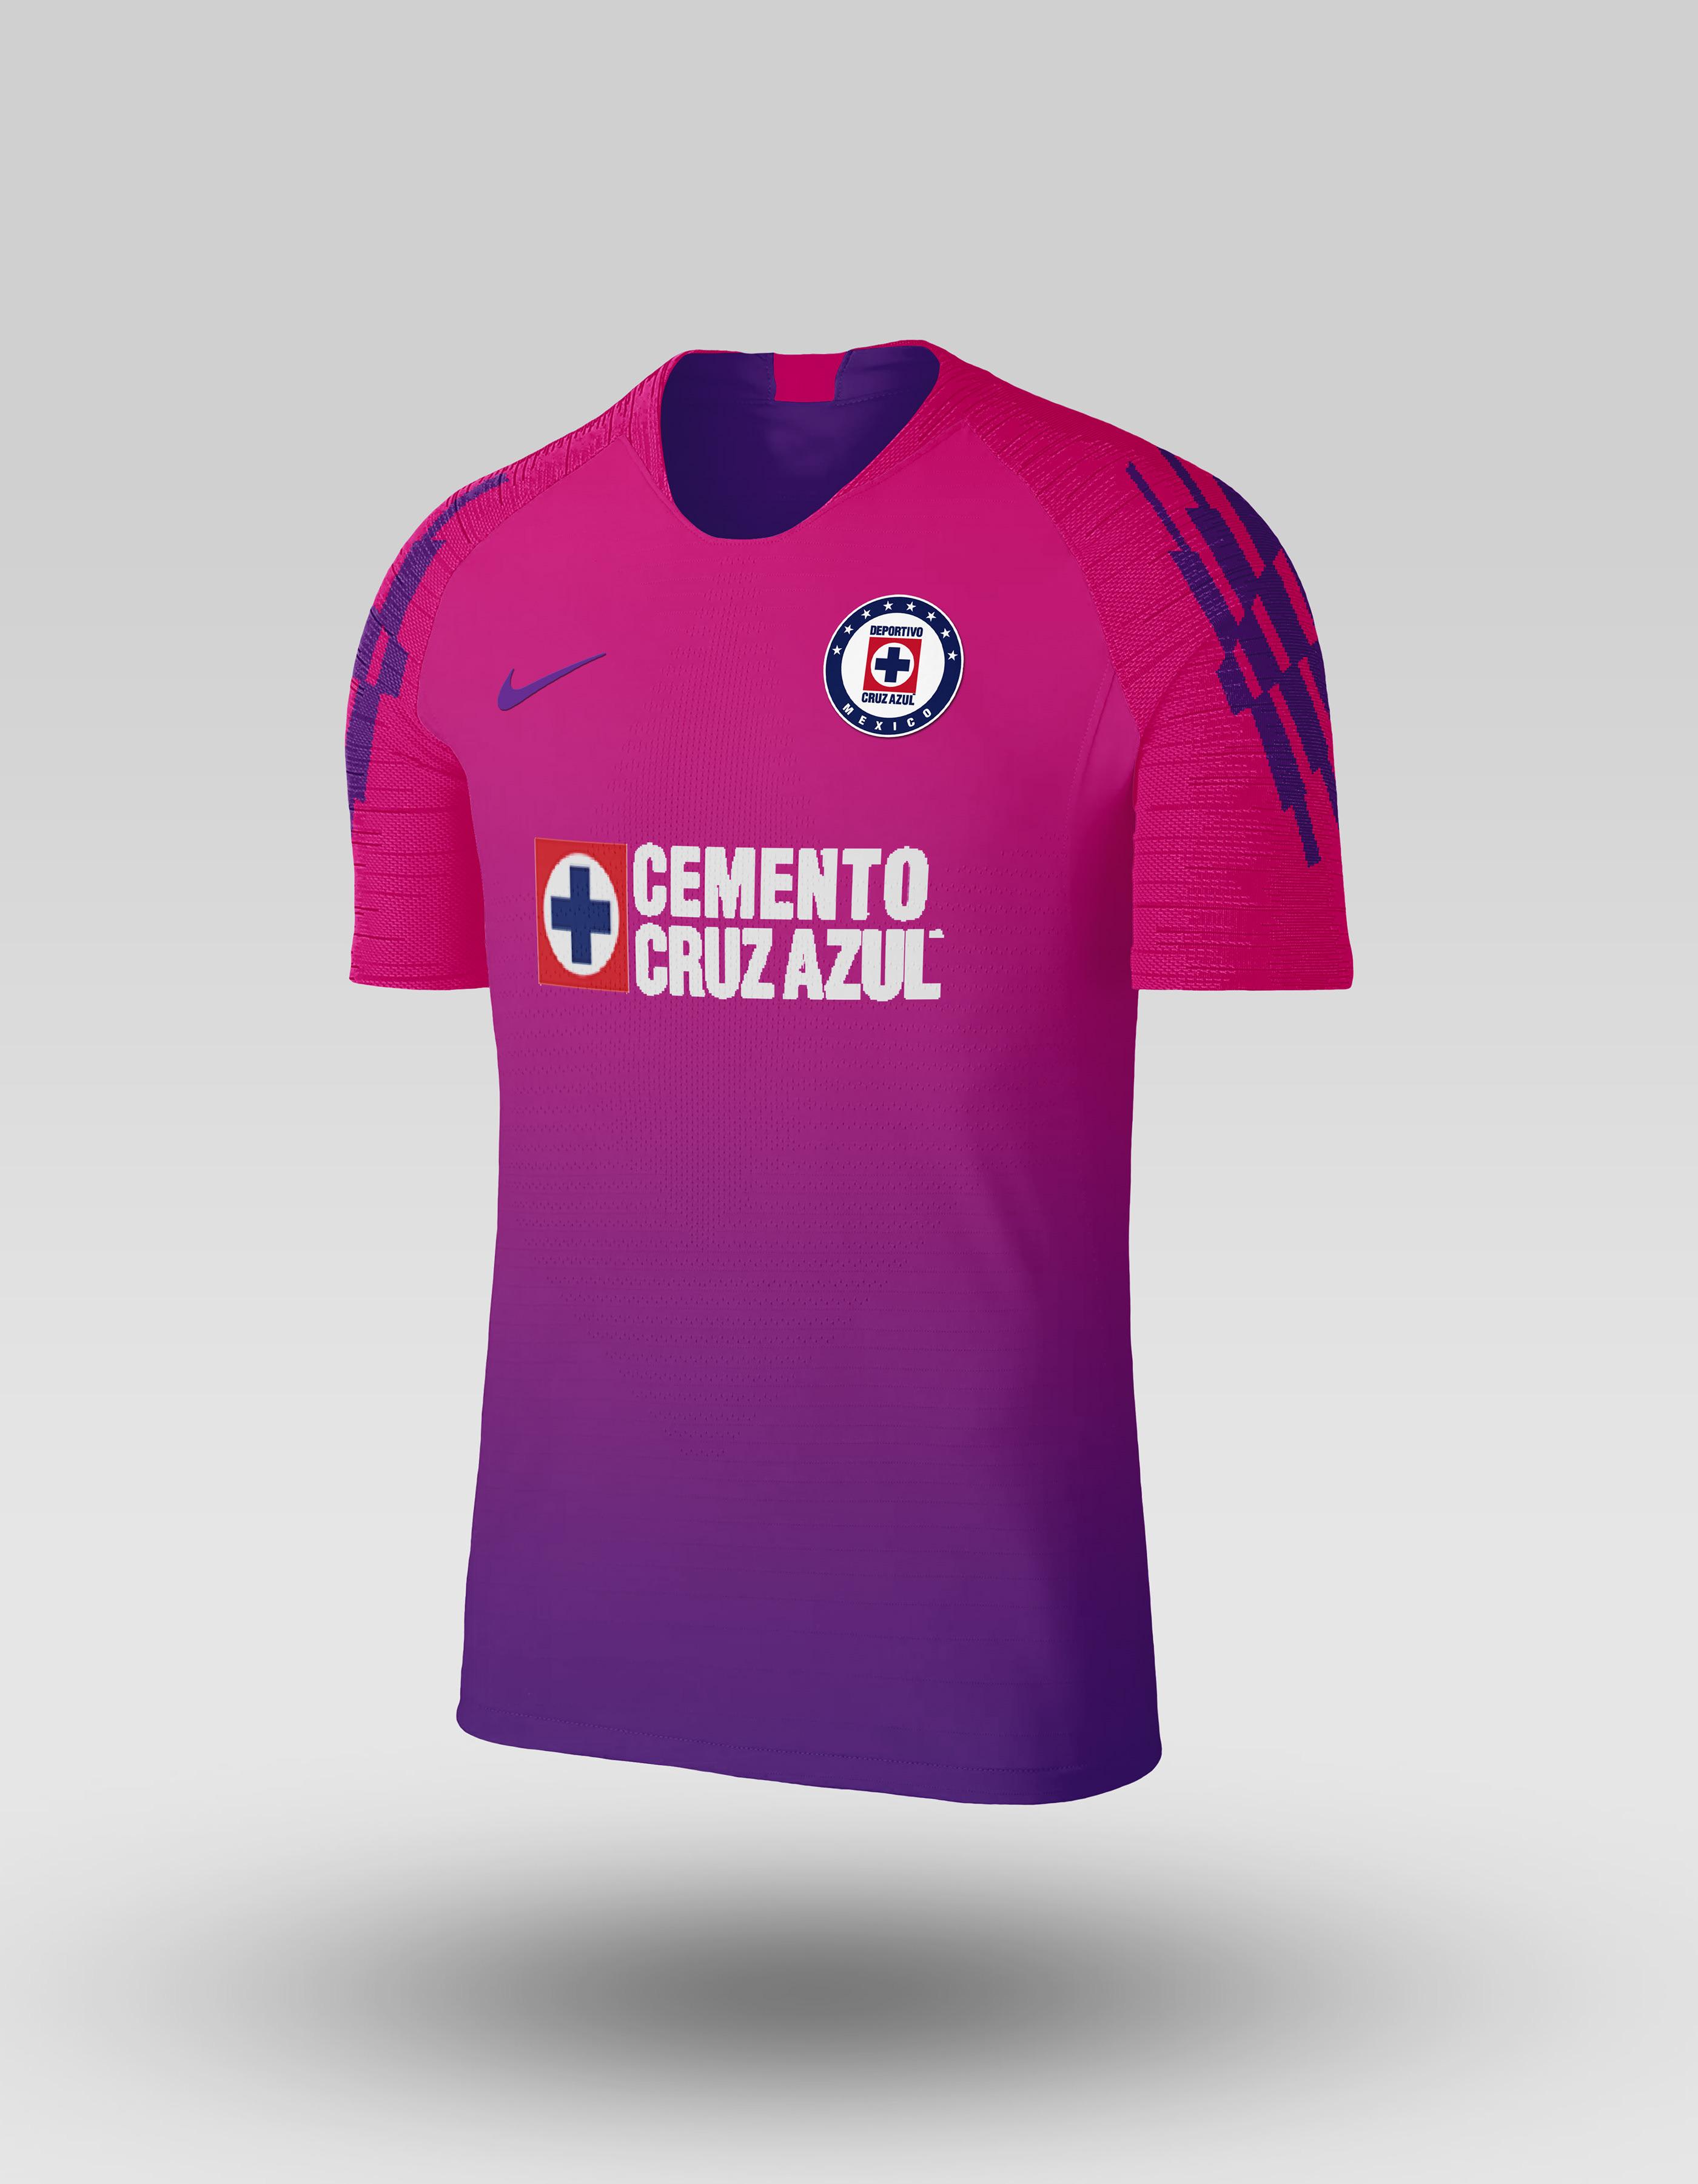 6ad2a7553 Nike Cruz Azul FC 2018-19 Vaporknit Collection on Behance